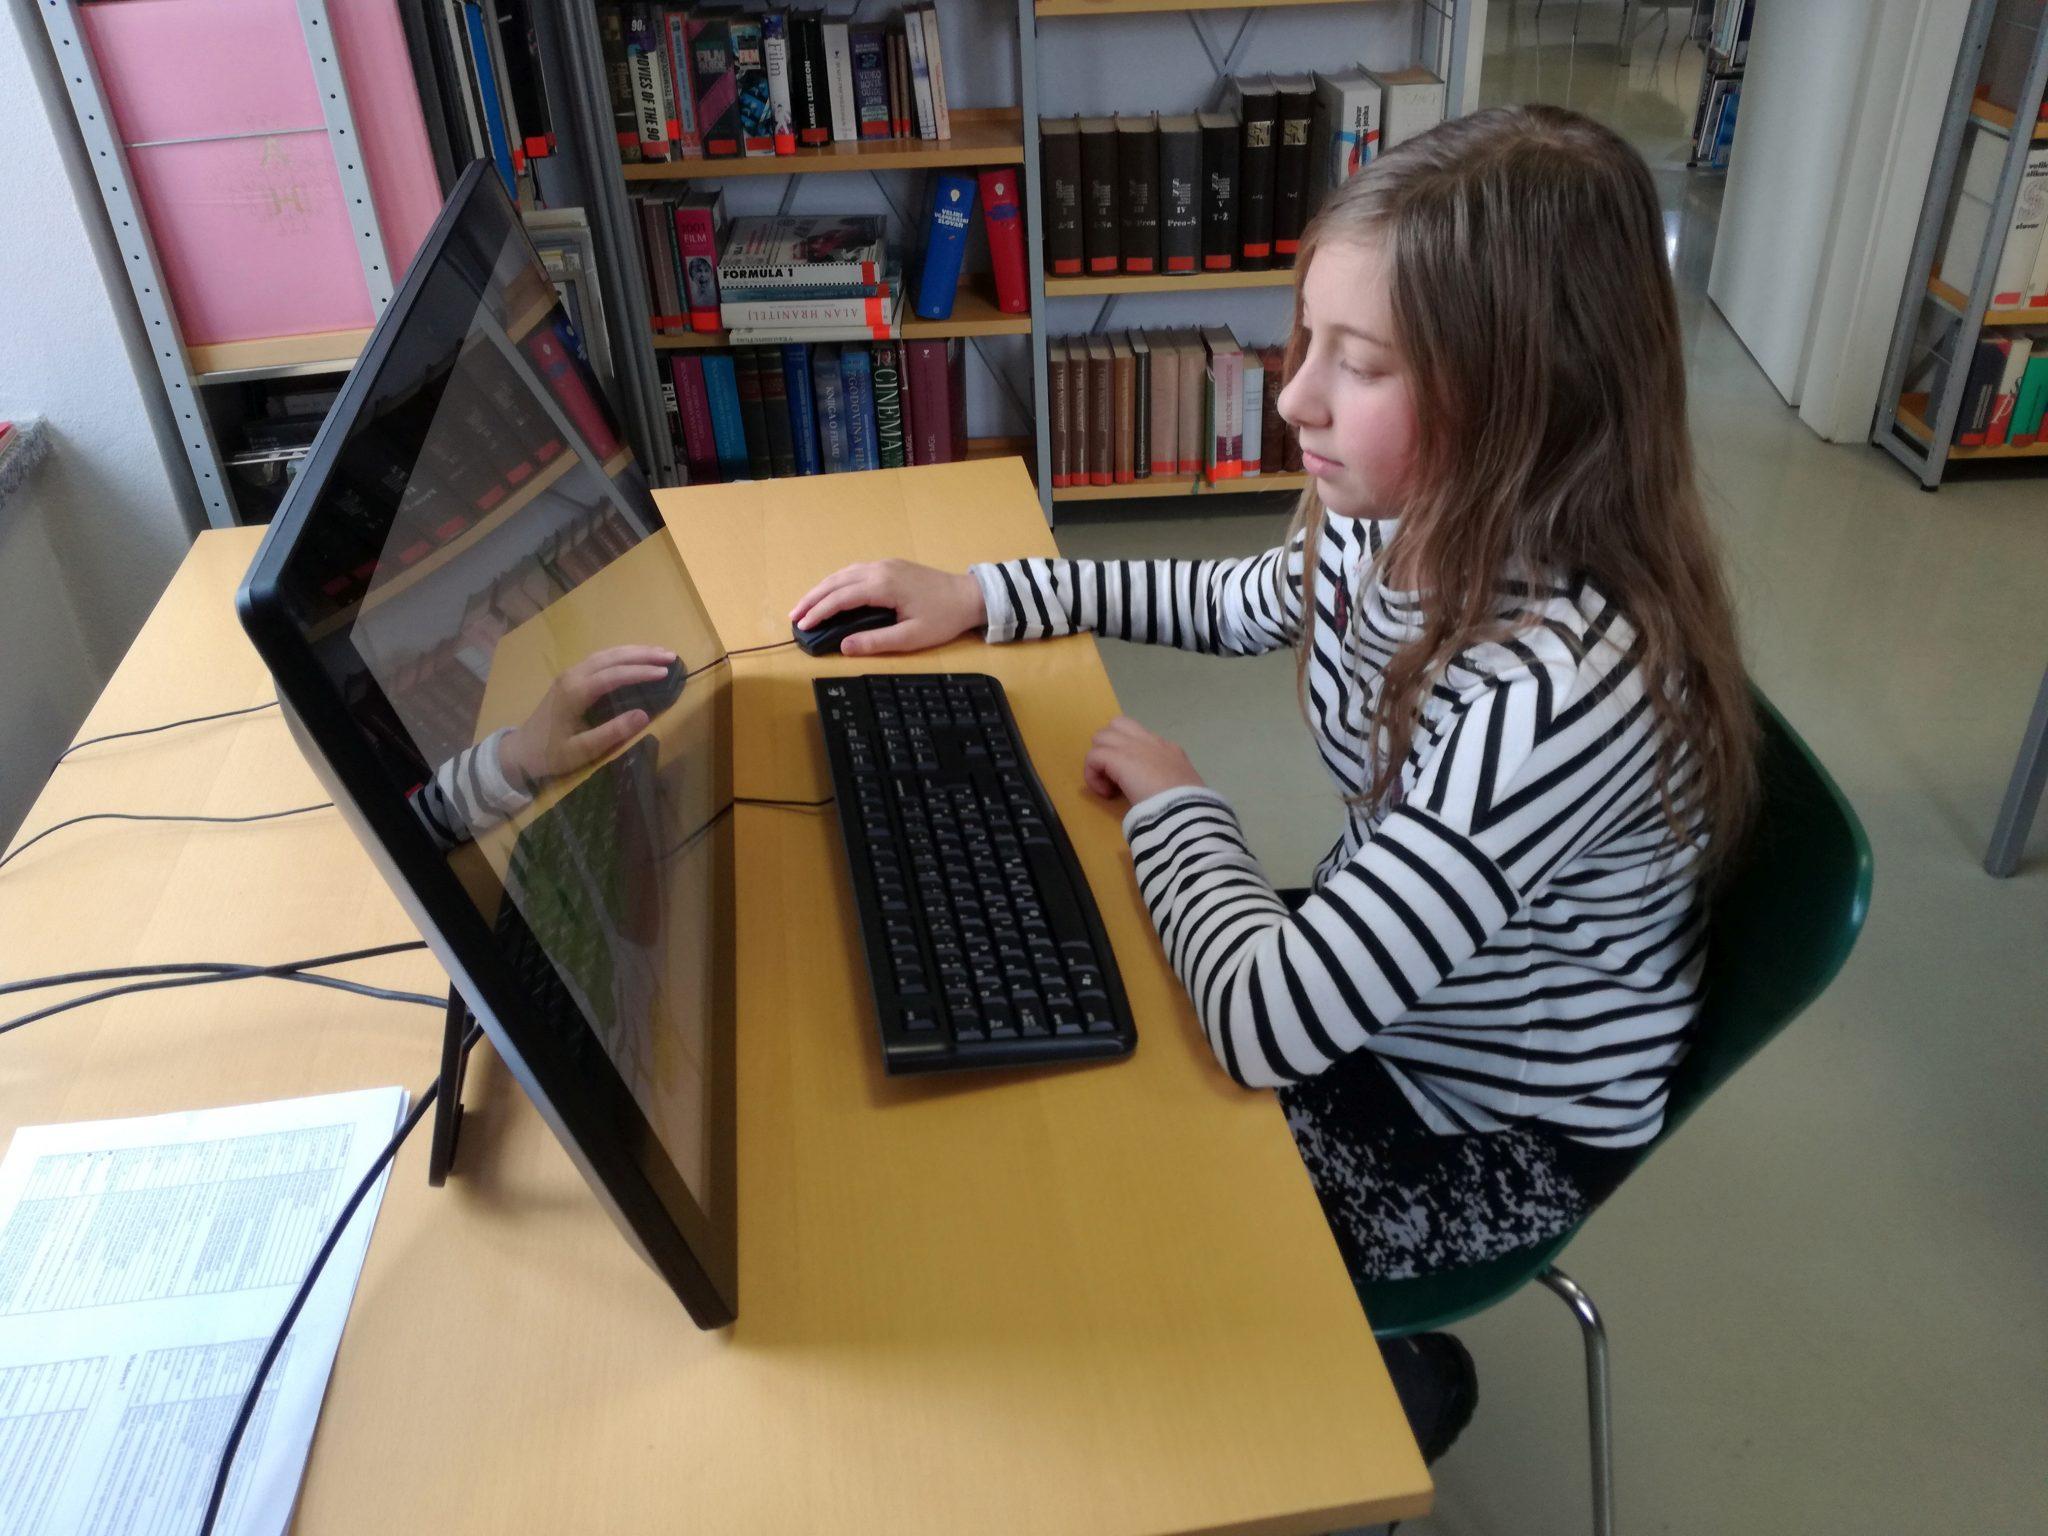 IMG 20180223 100129 - Zimske počitniške urice v knjižnici